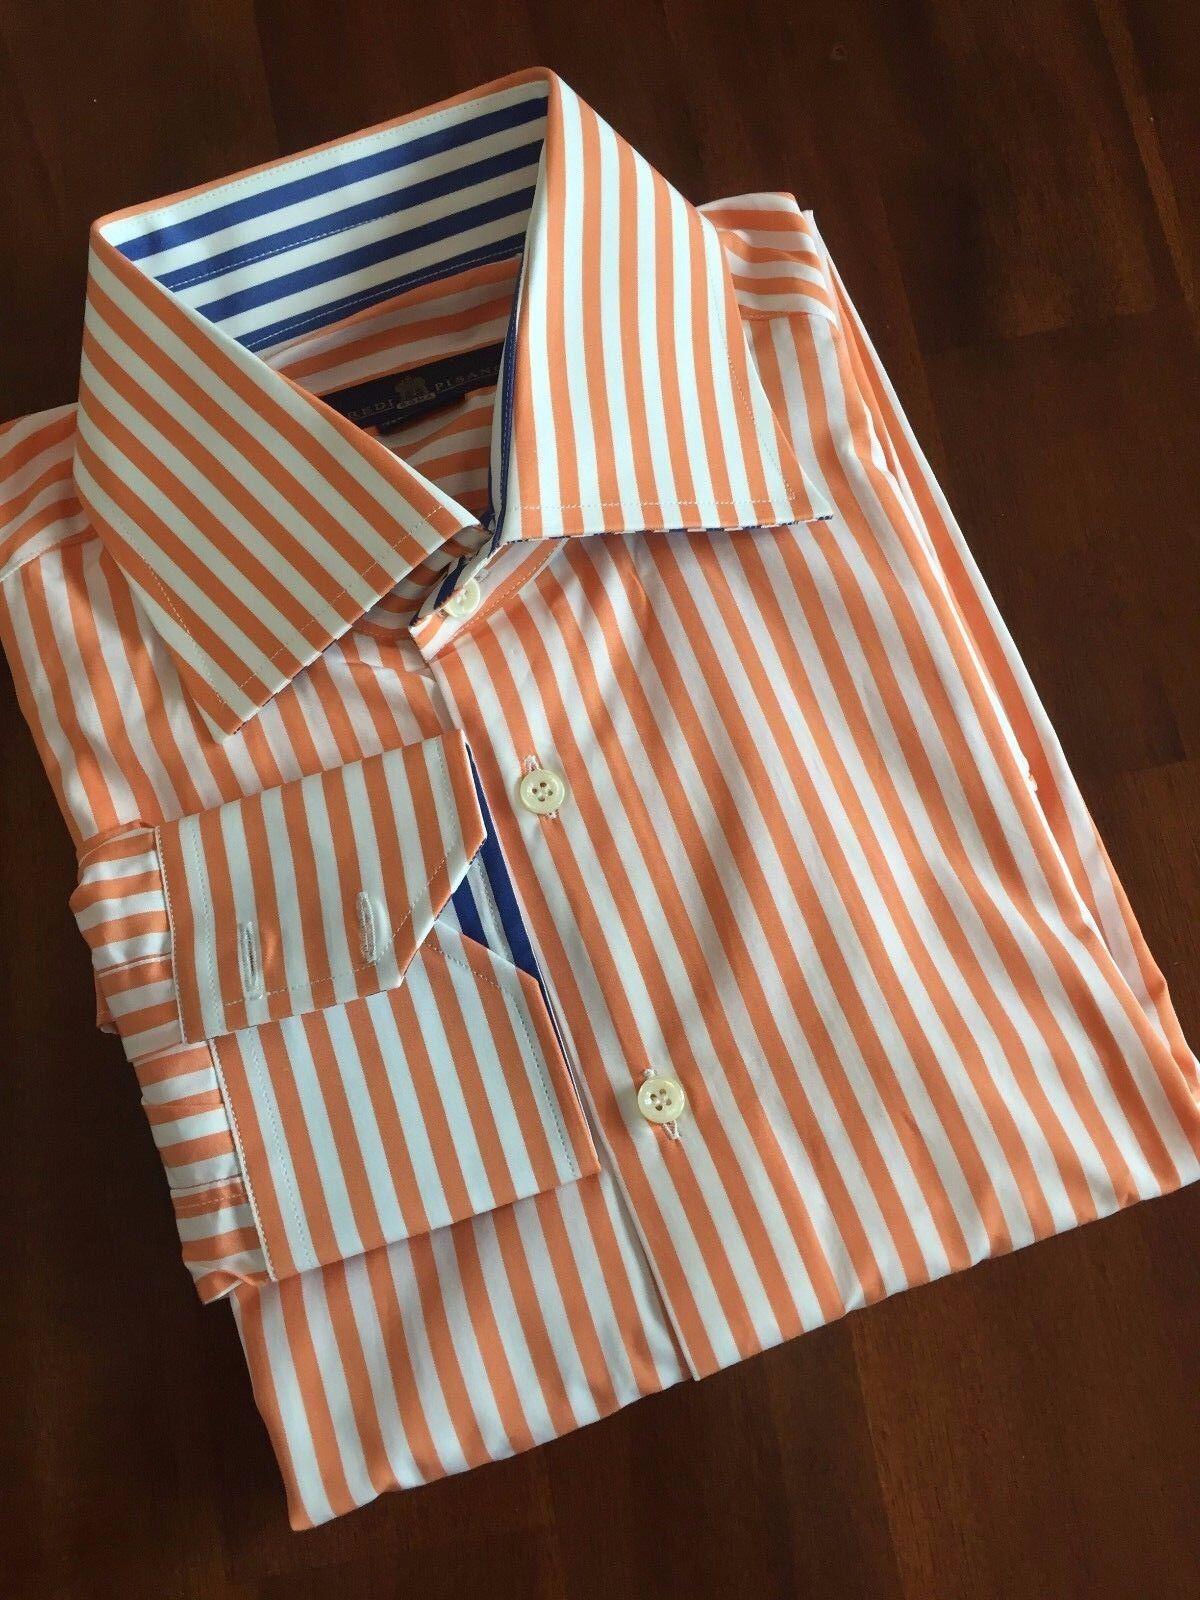 EREDI PISANO THE DOBLE BUTTON COLLAR orange  blueE SHIRT ( 15 3 4 40 )   275